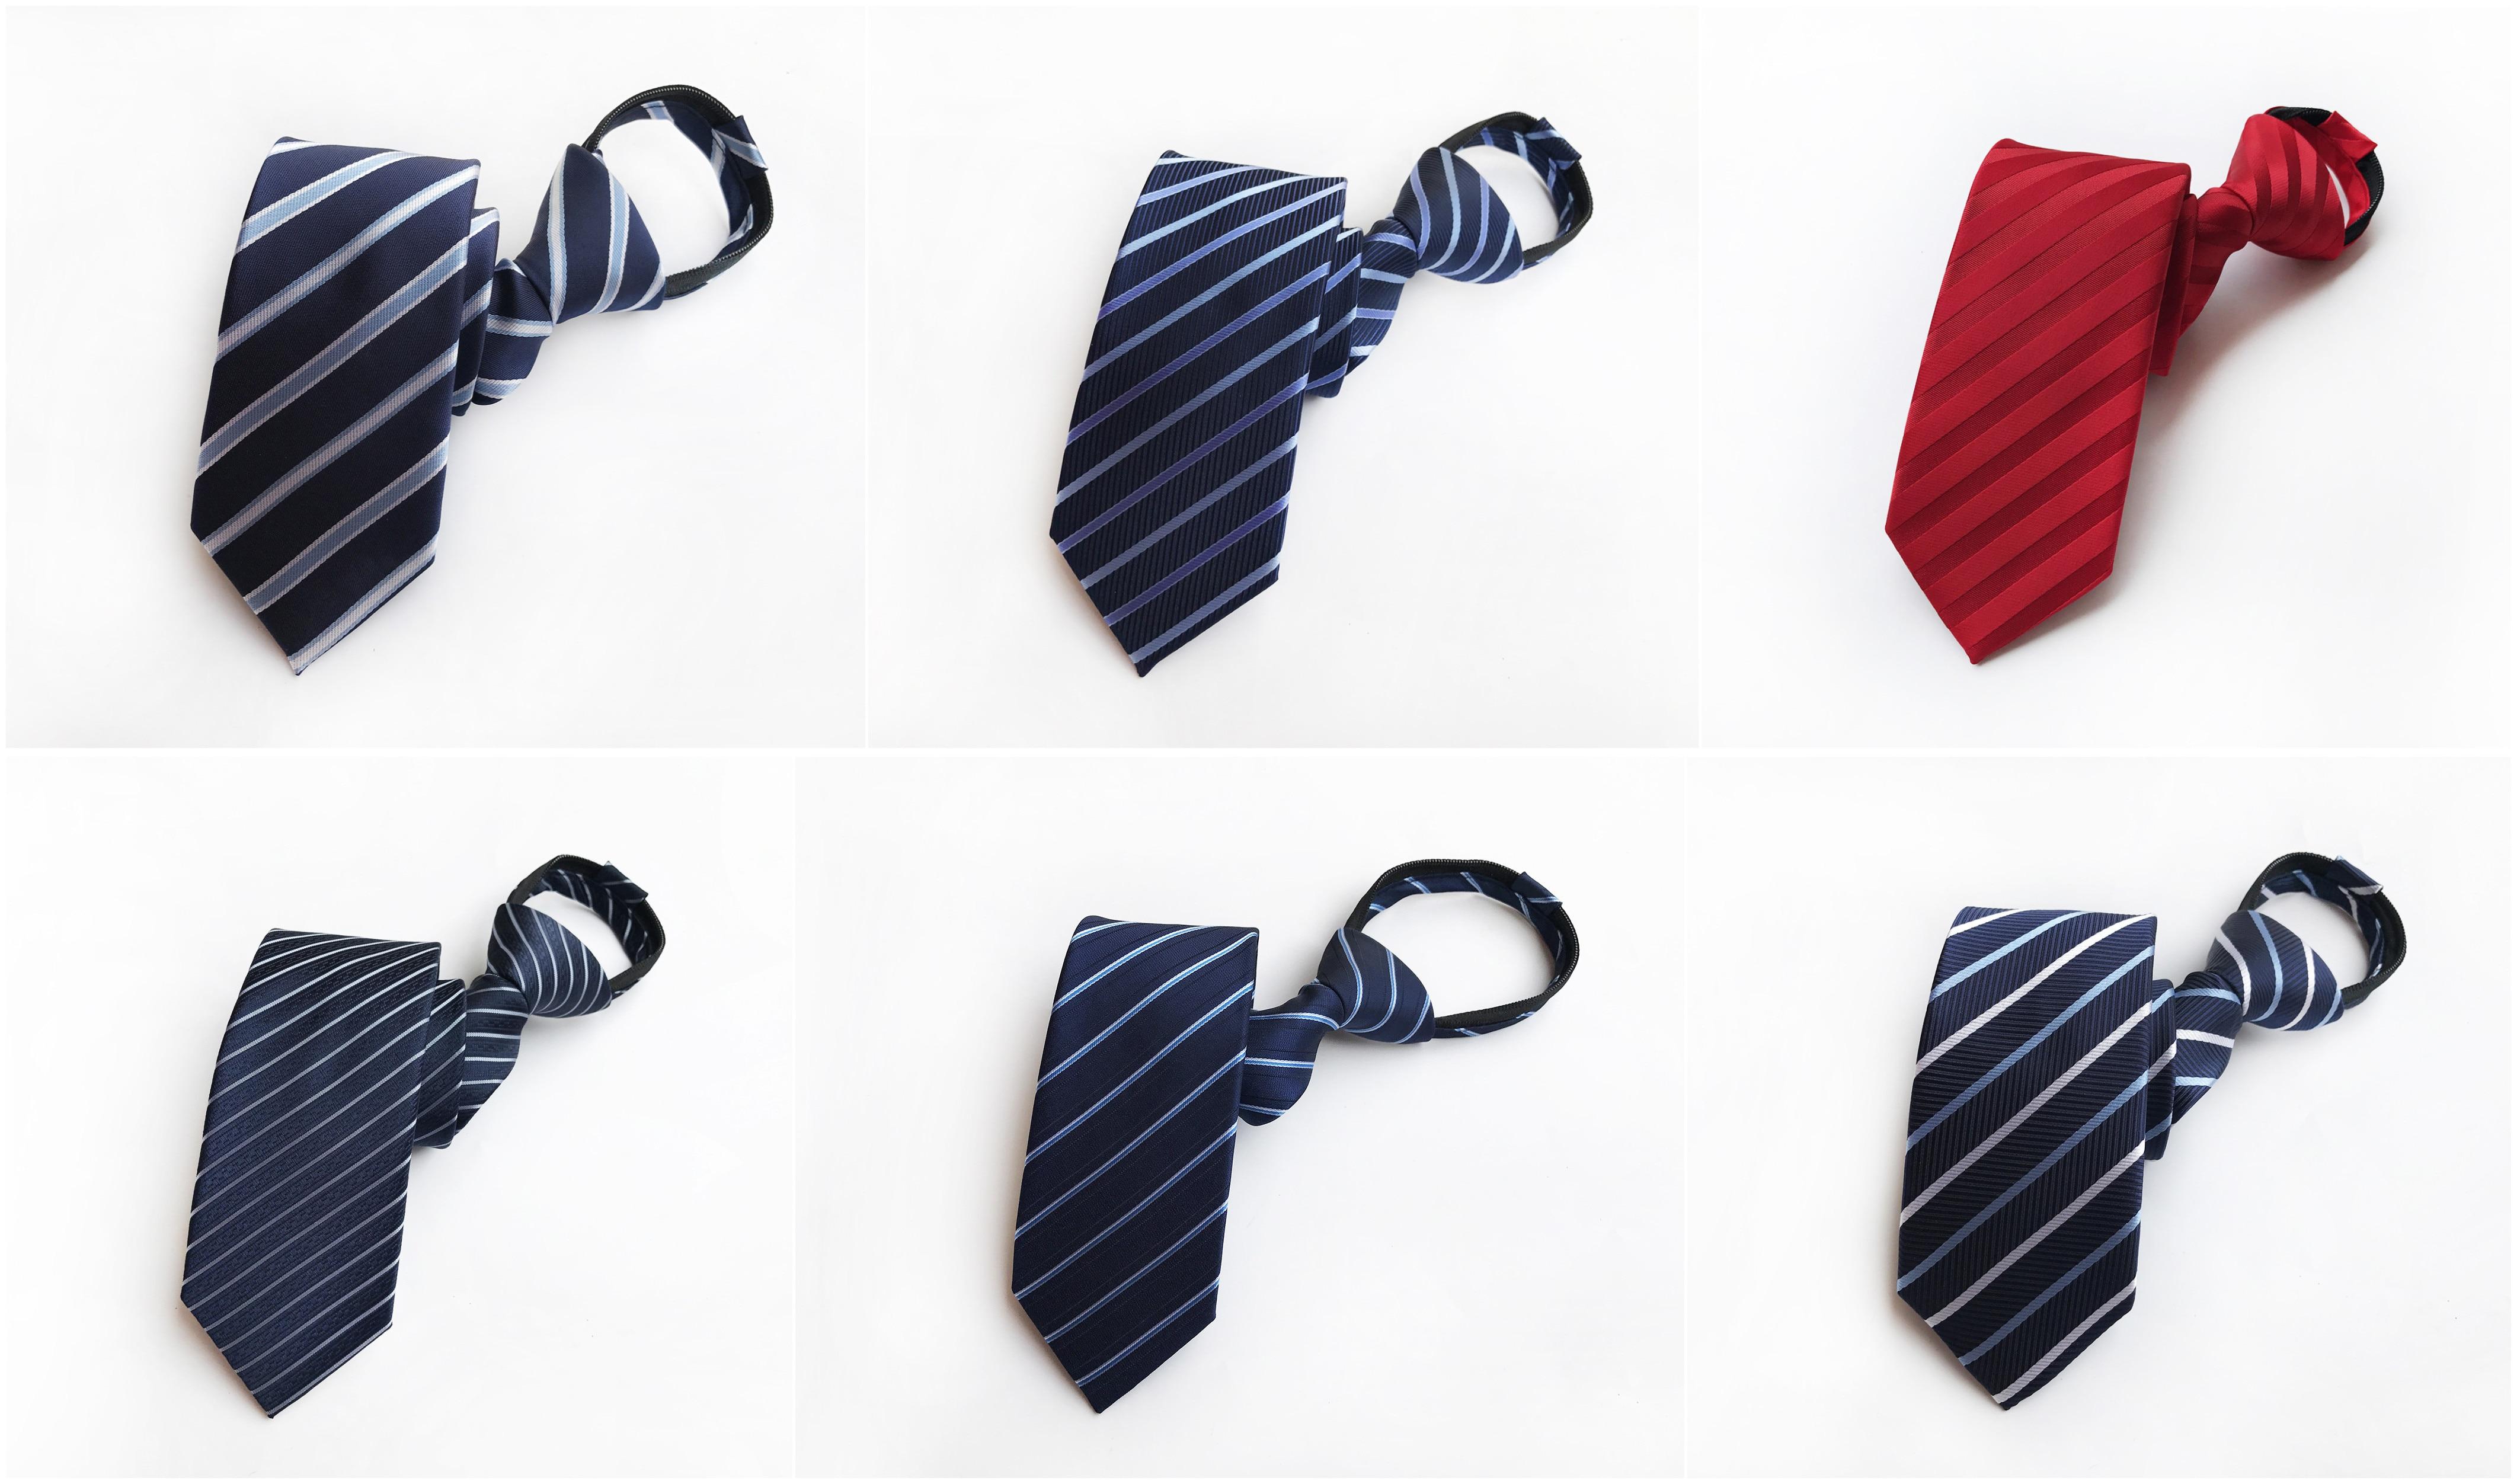 Men's Simple Personality Unique Design Fashion Convenient Fast Zip Tie 8 Cm Wedding Groom Lazy Easy To Pull Decorative Tie